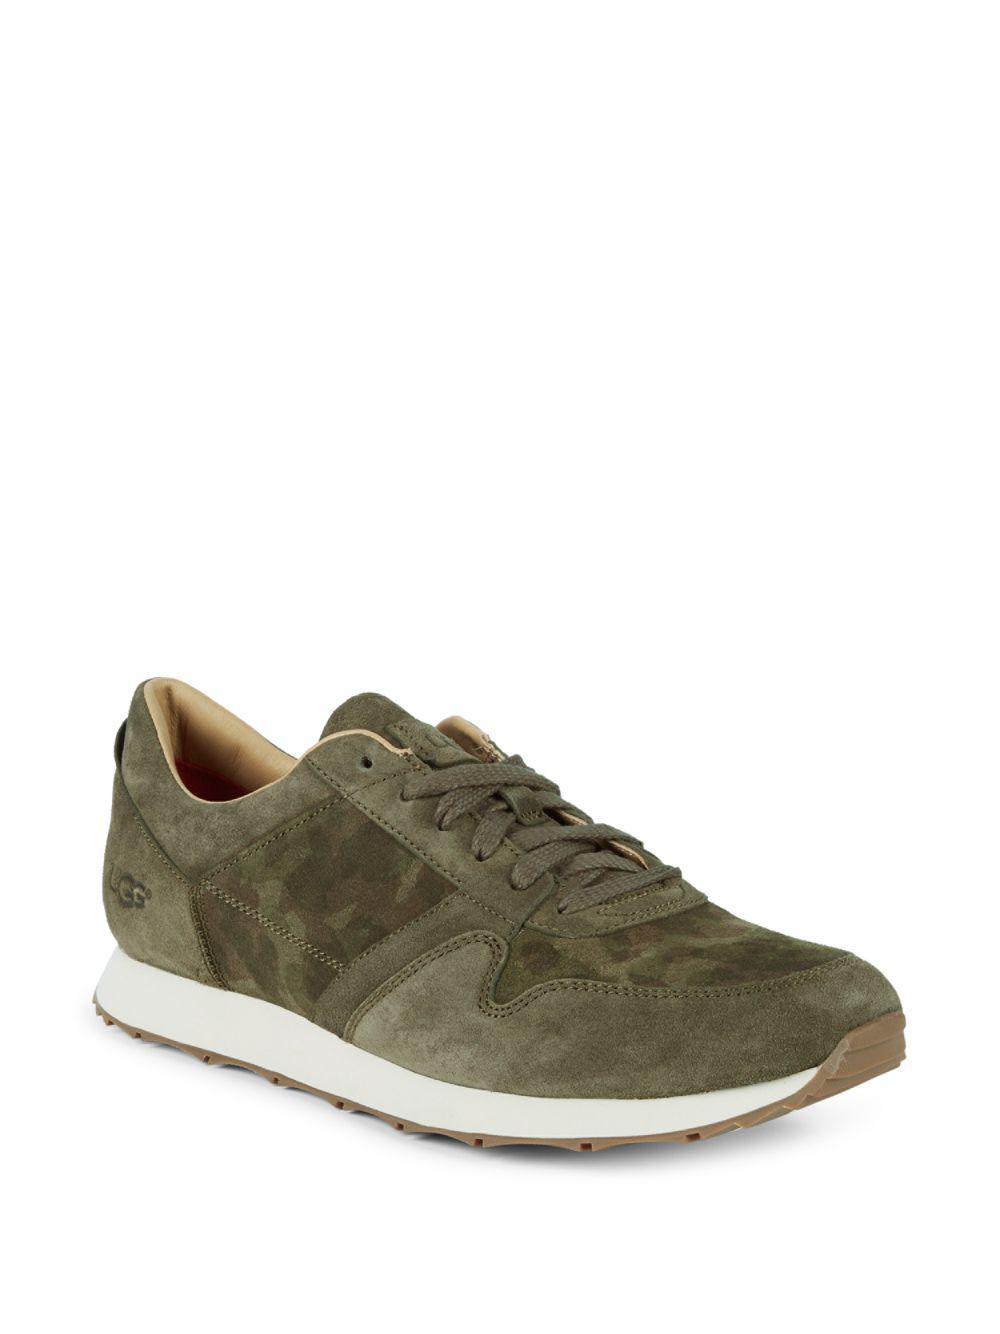 Sneaker TRIGO suede Logo camouflage khaki UGG EhBHMv